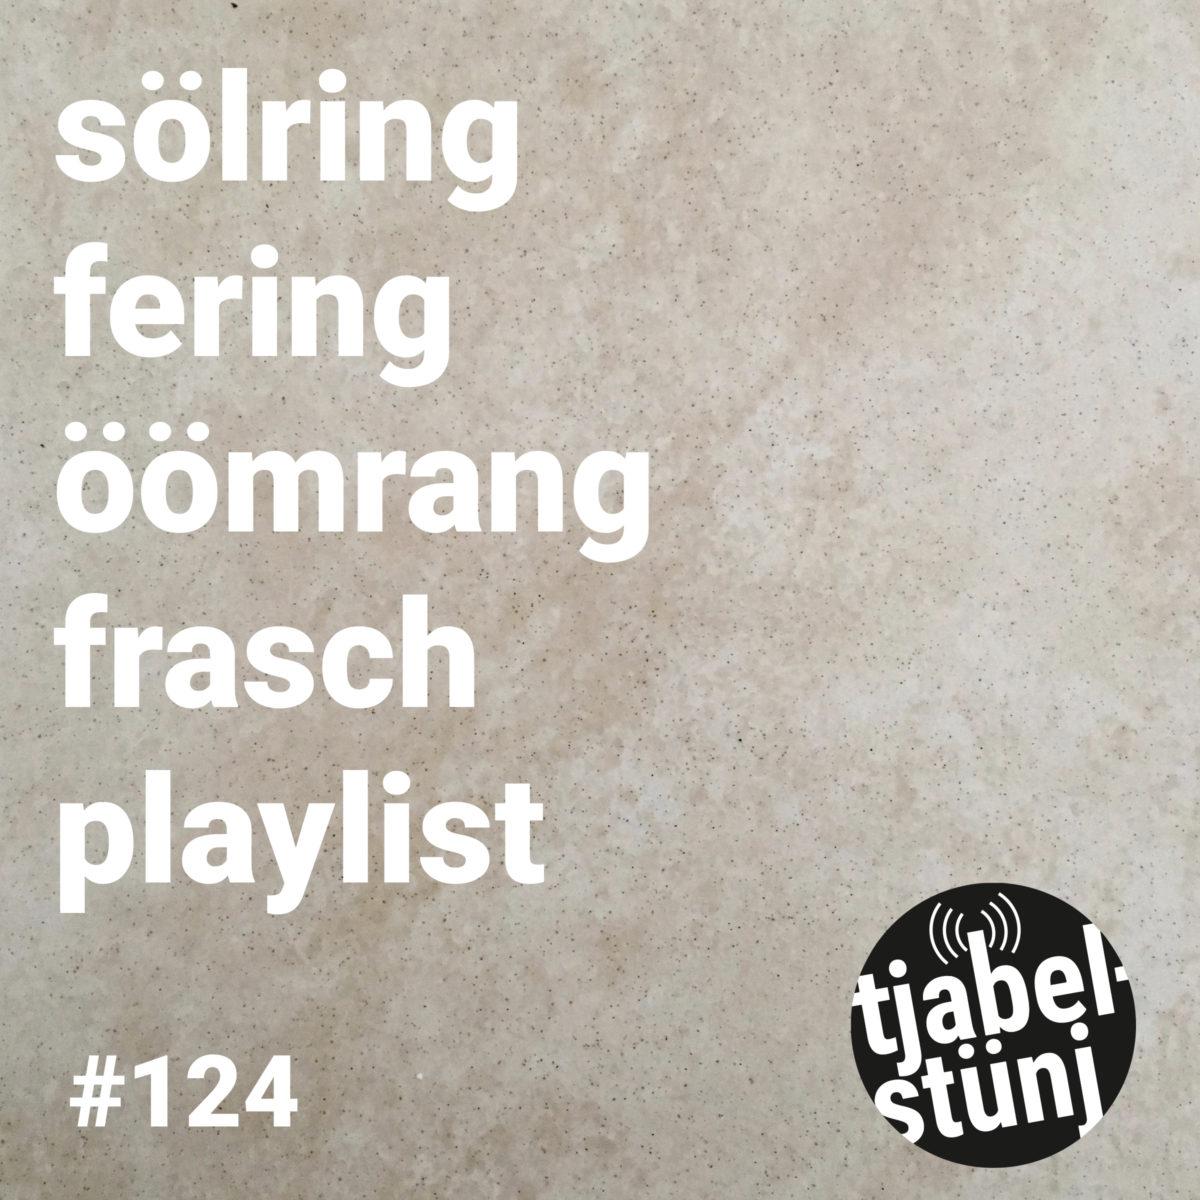 Playlist #124